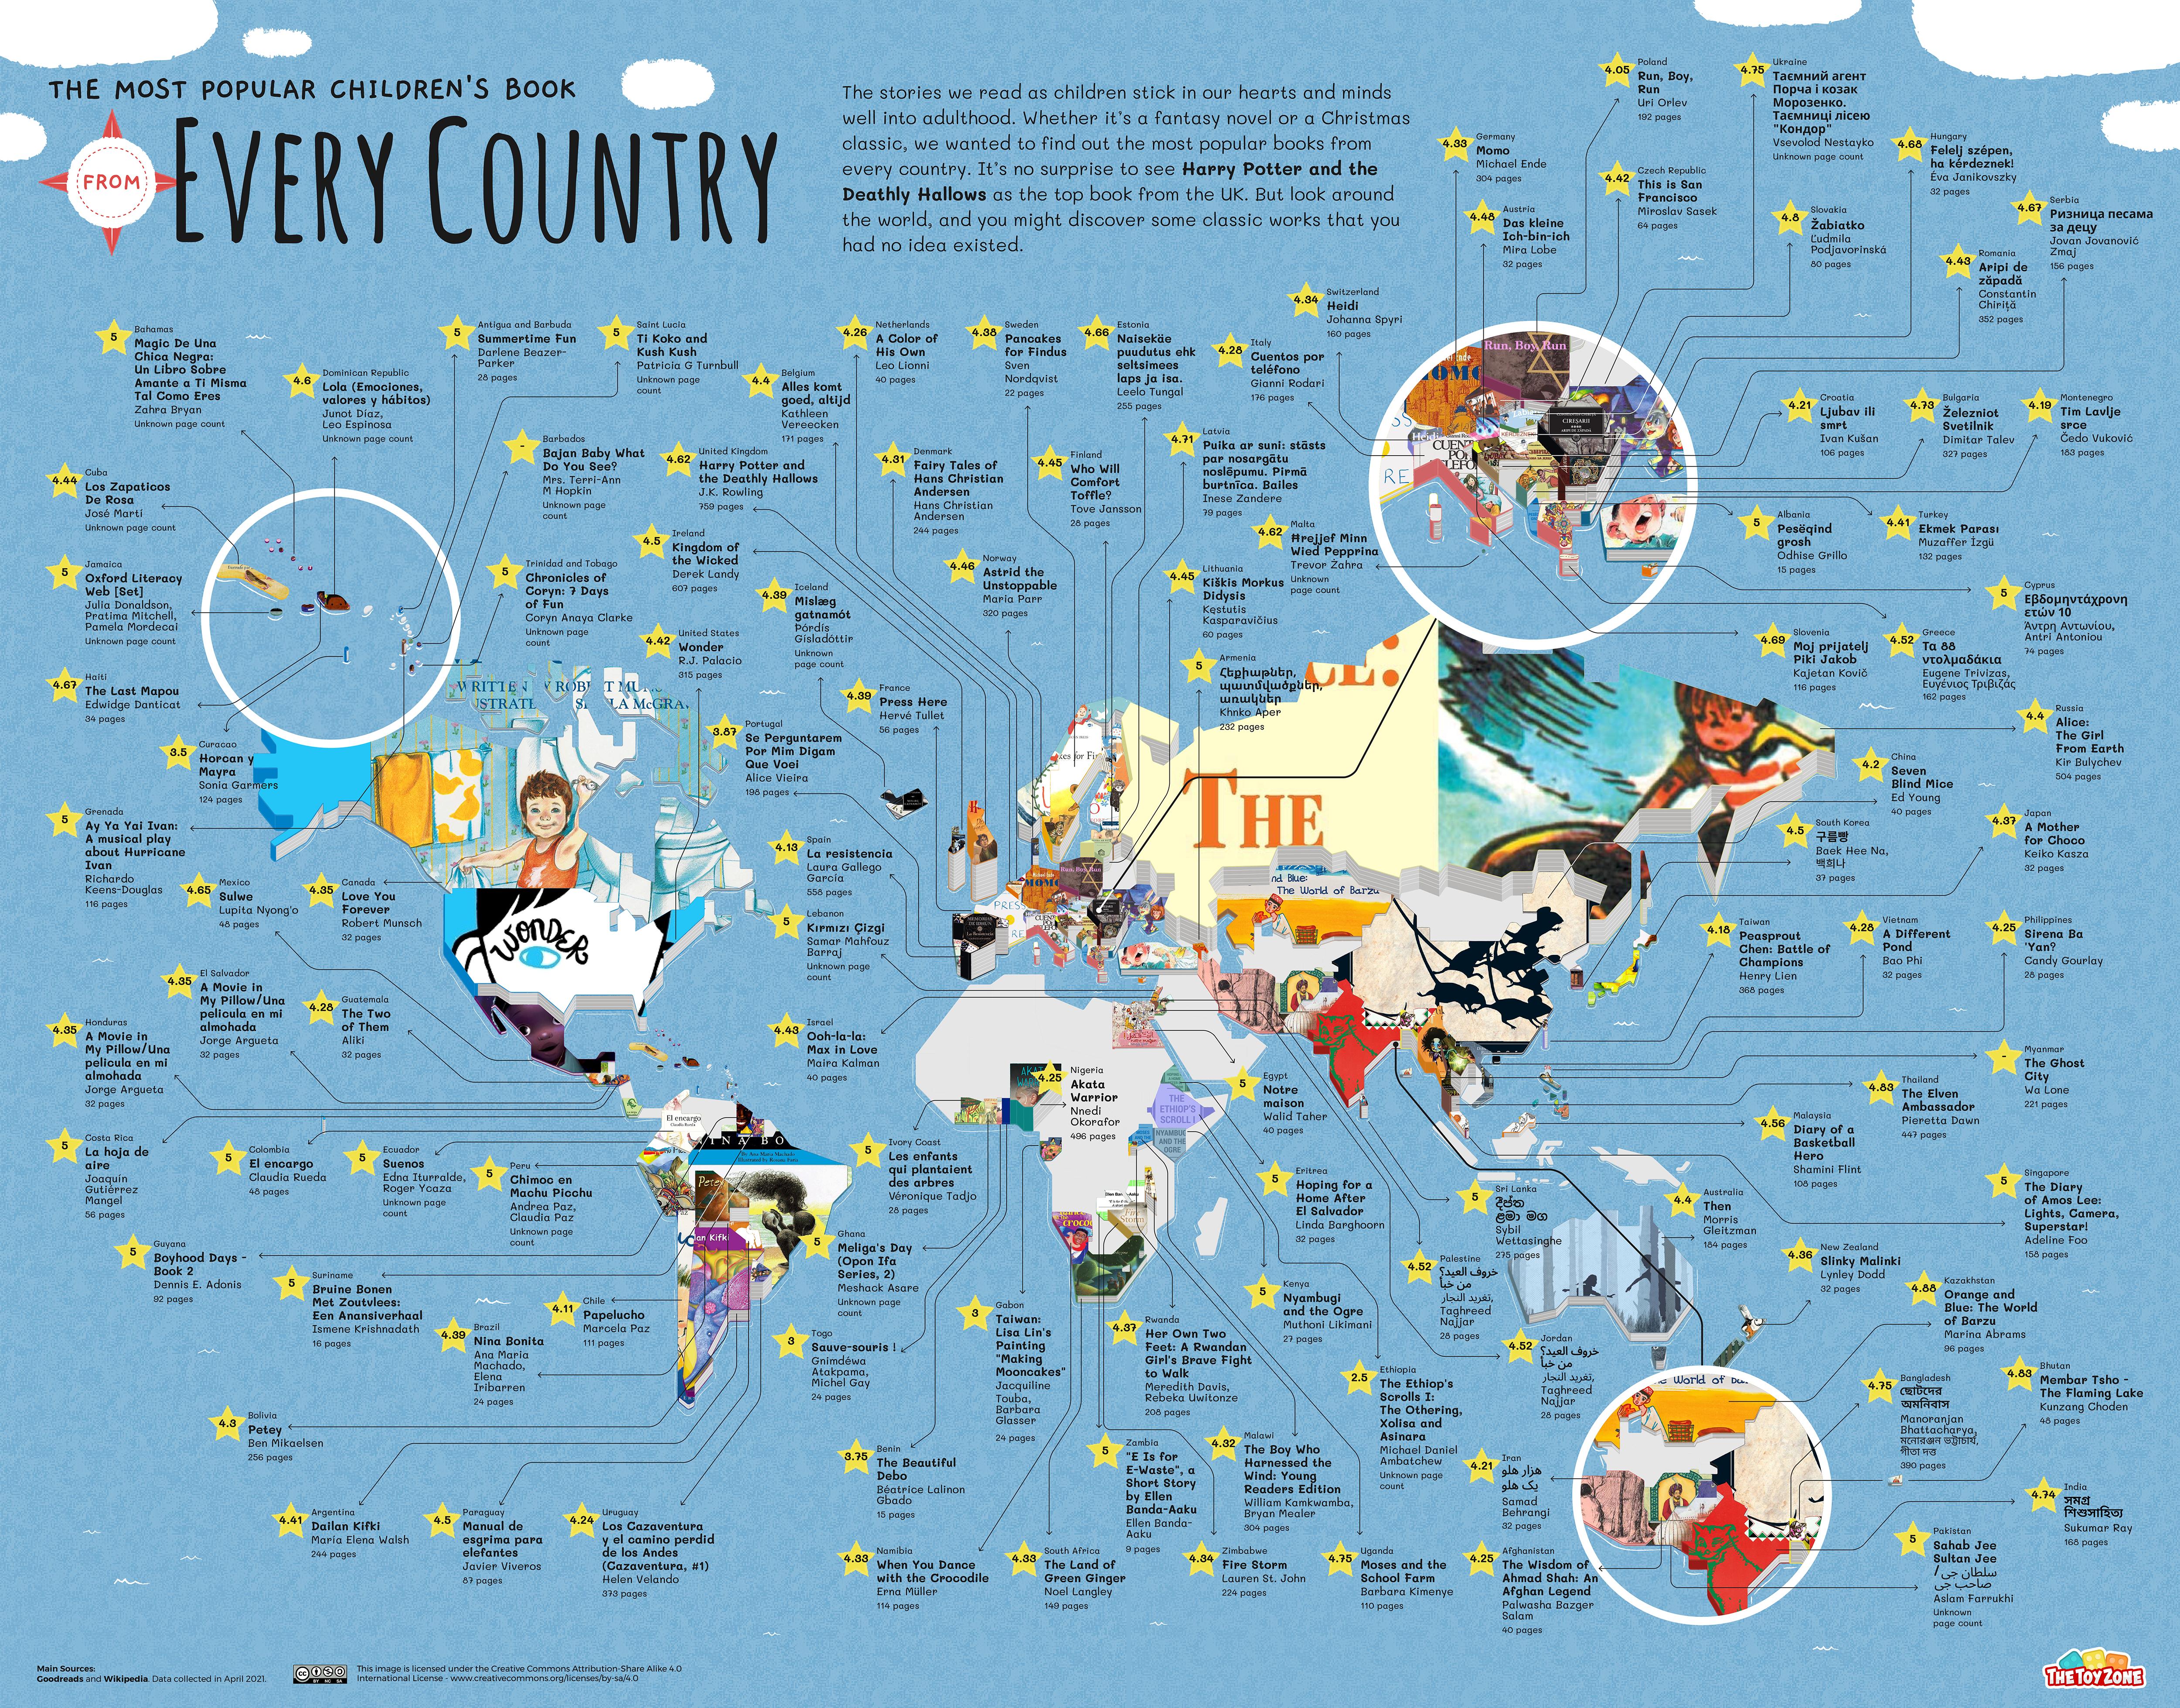 Most popular children's books world map